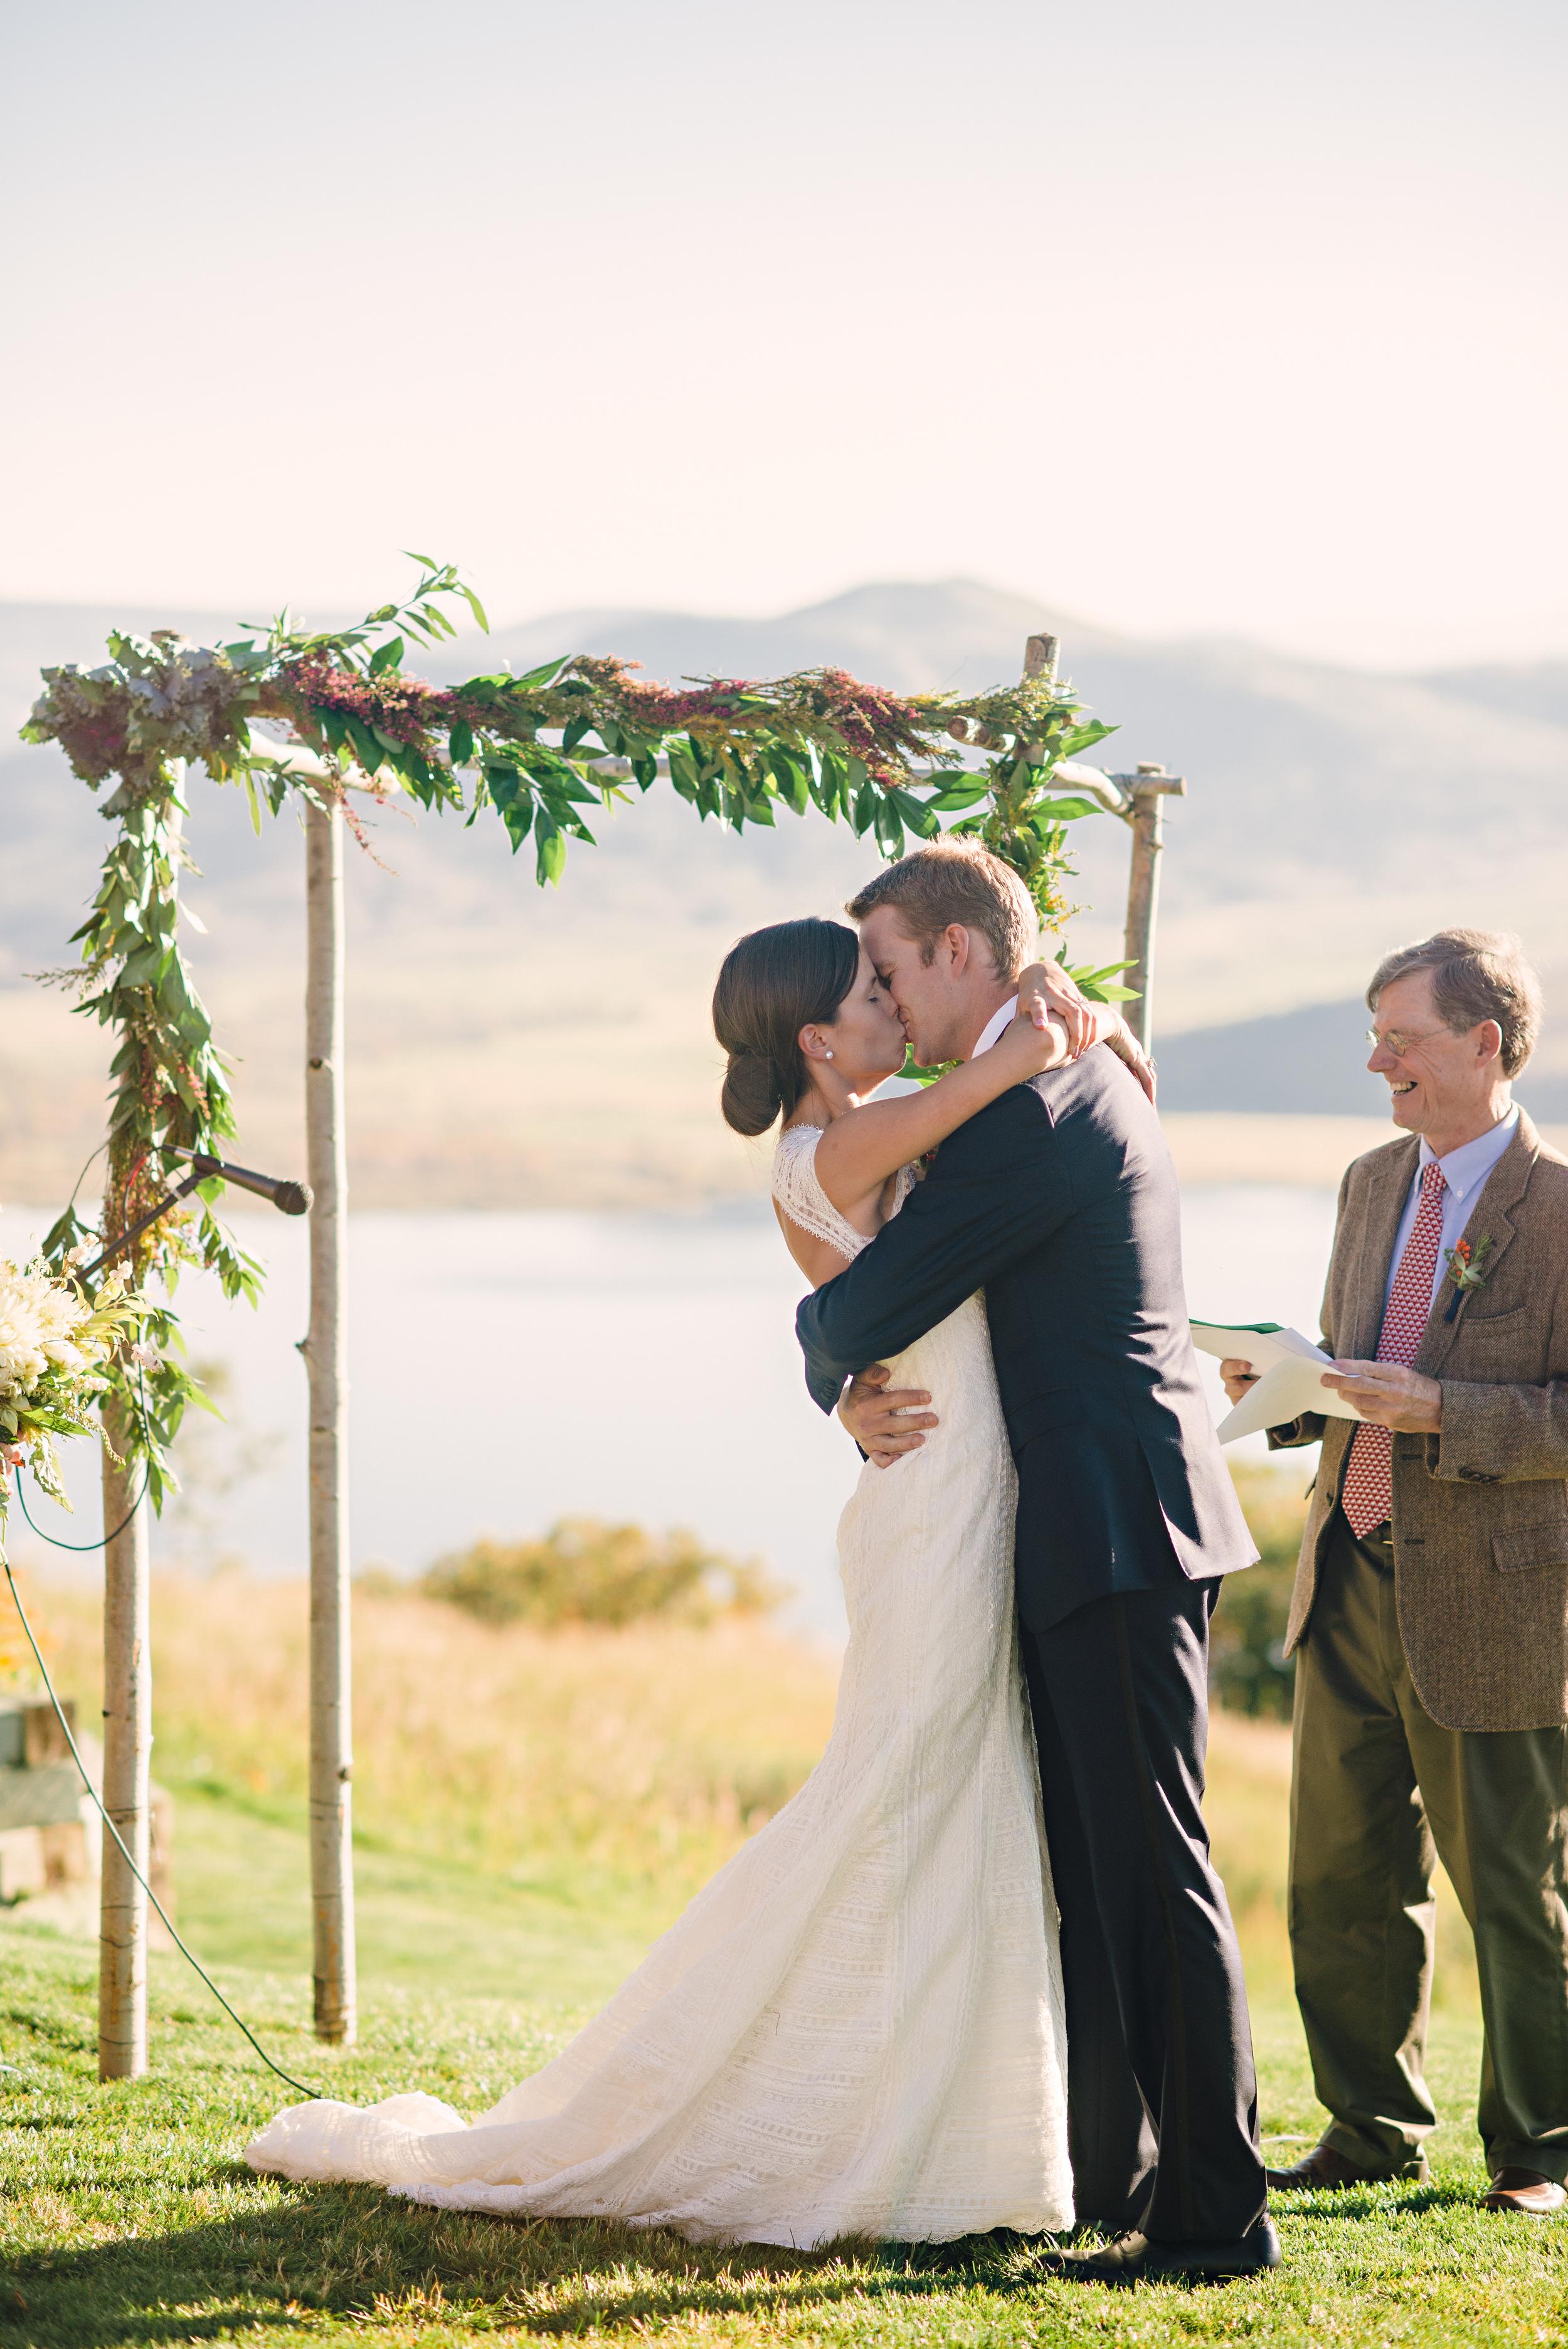 Brad&Libby_Wedding_Photos22530.jpg